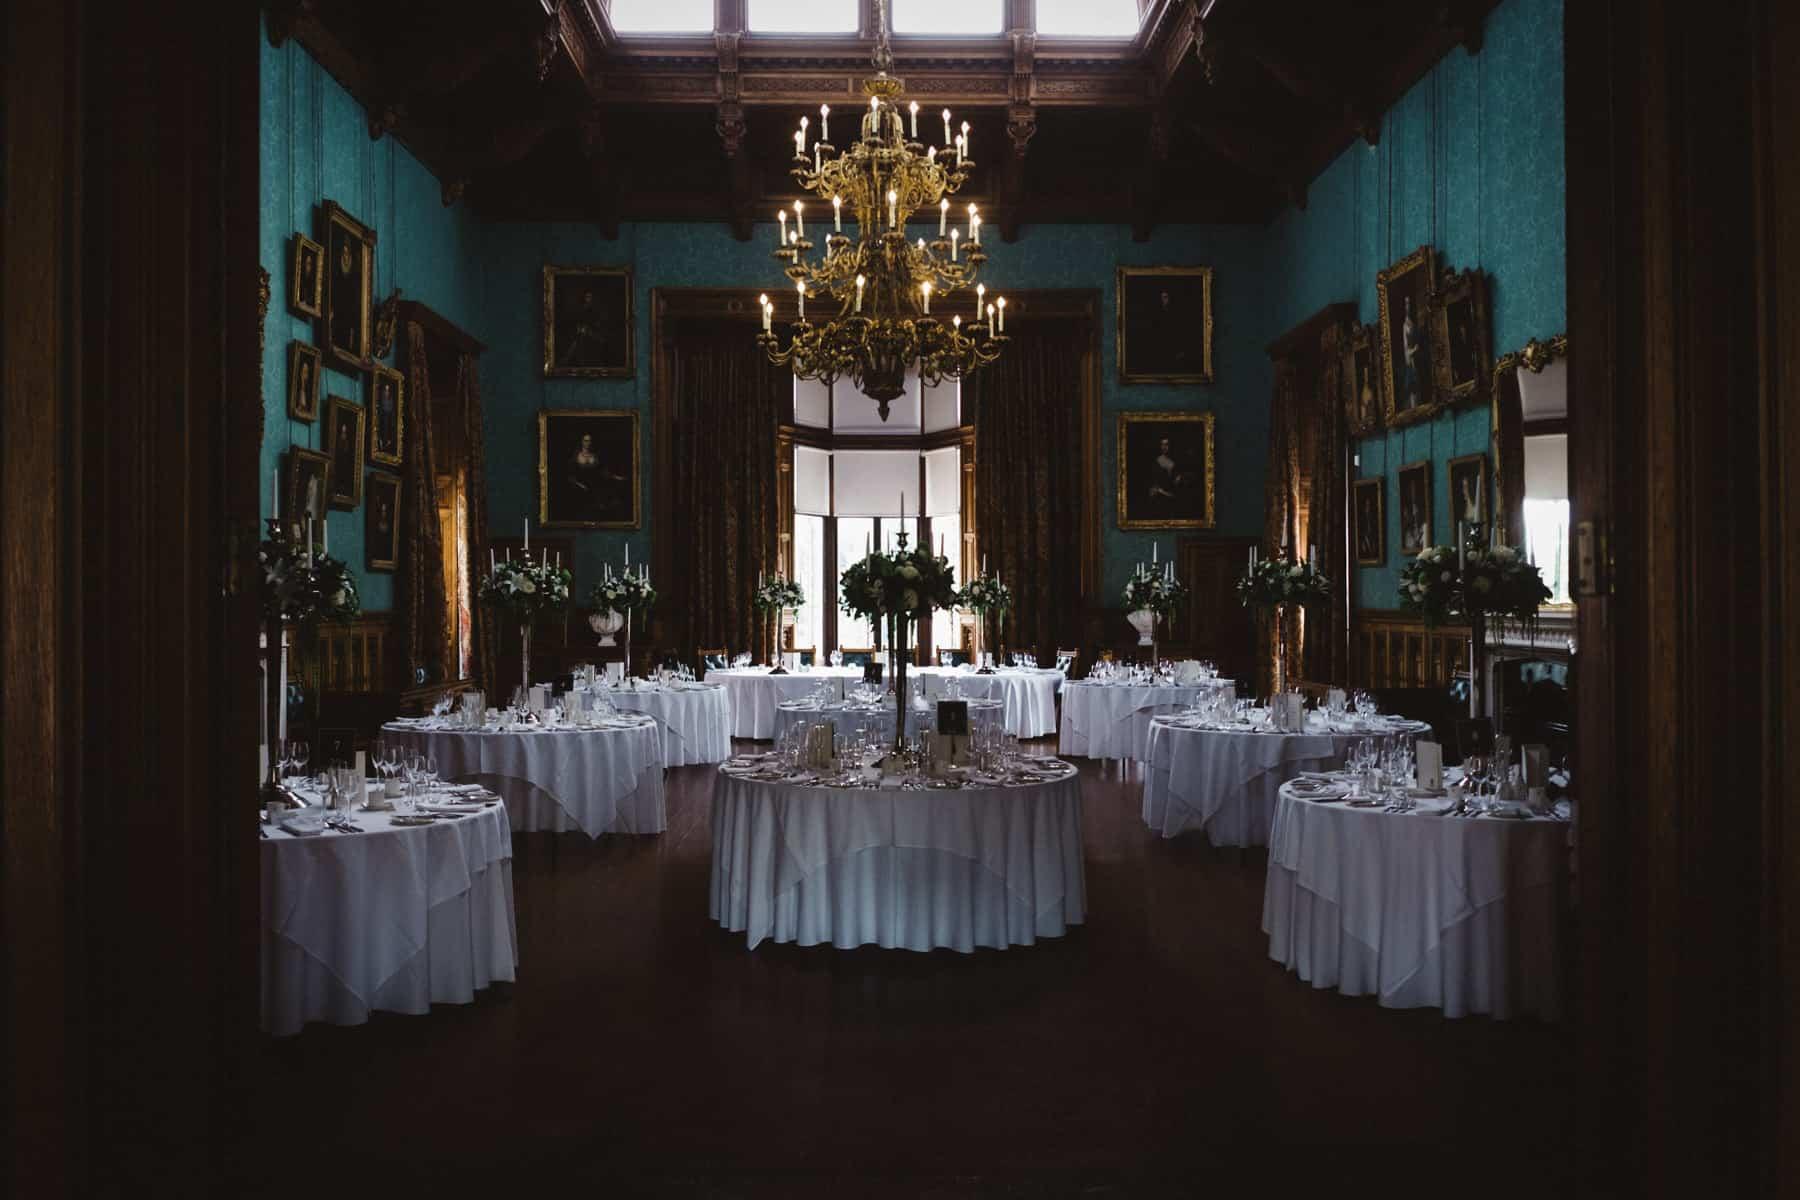 wedding photography venue (1 of 1)